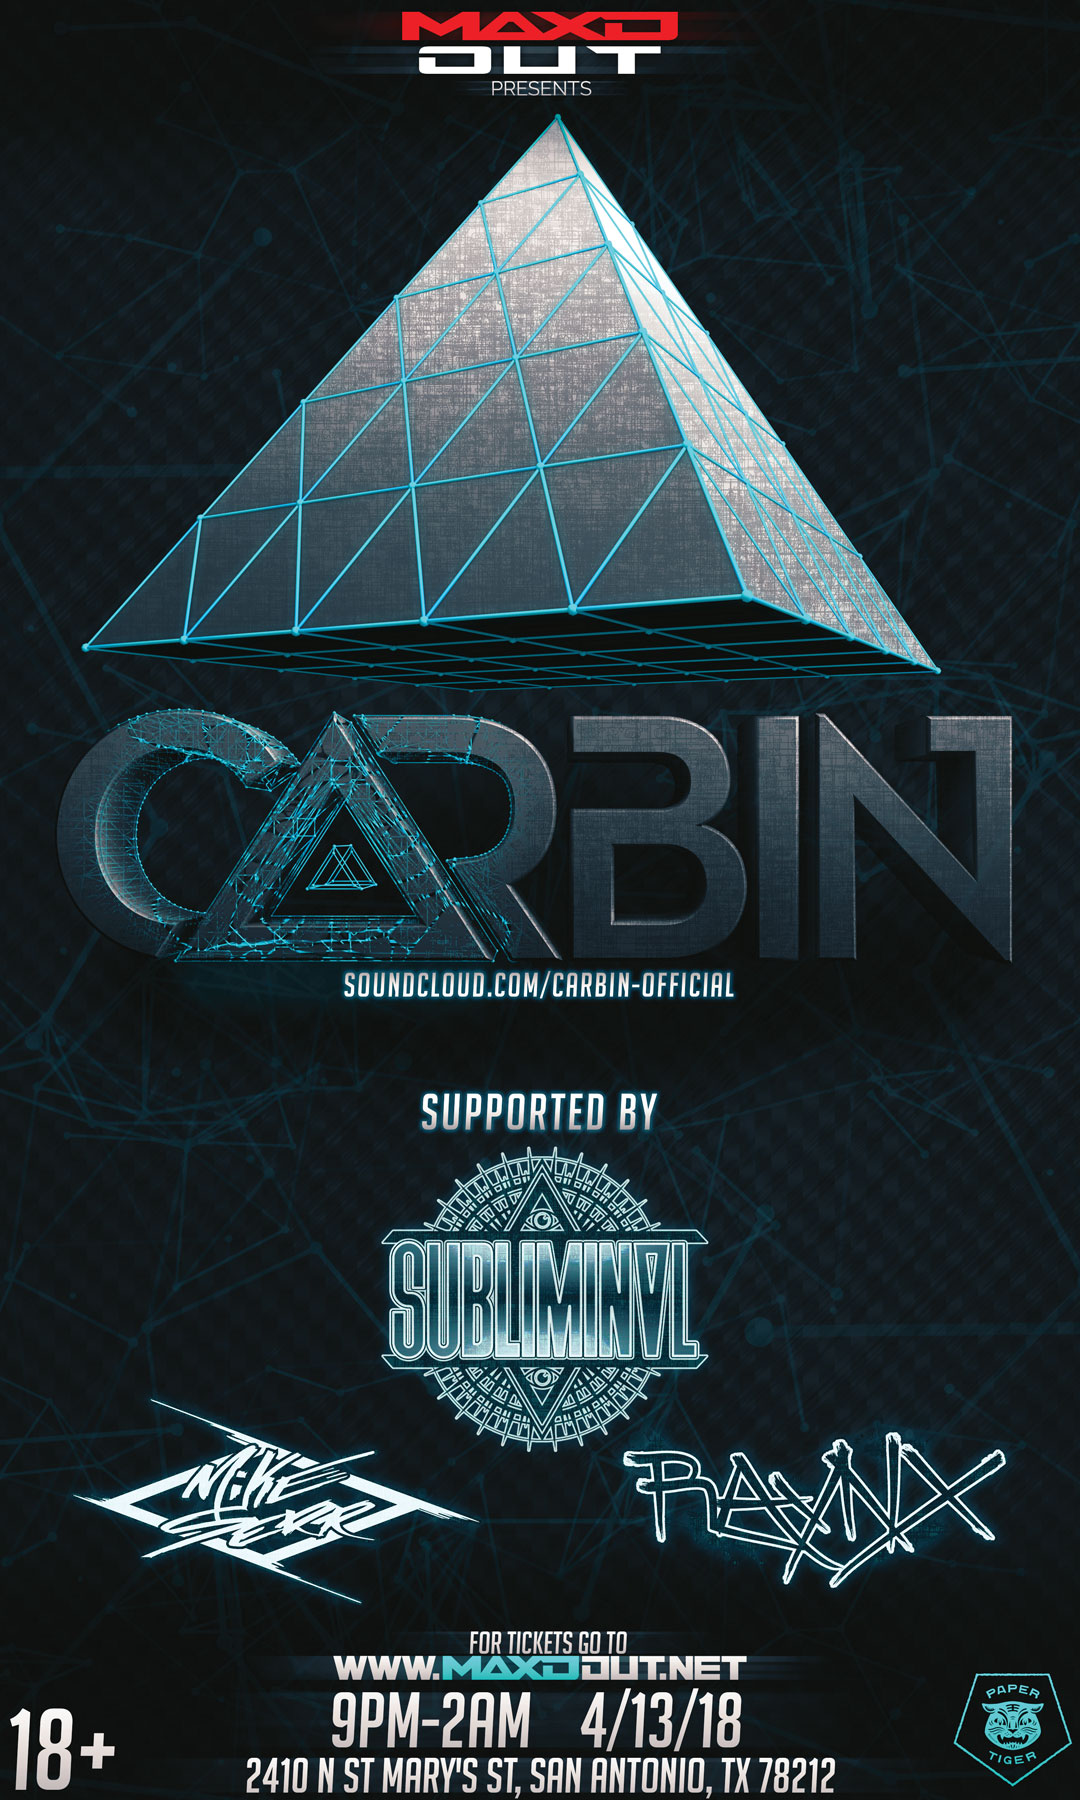 Carbin-Flyer-FINAL-LOWRES.jpg